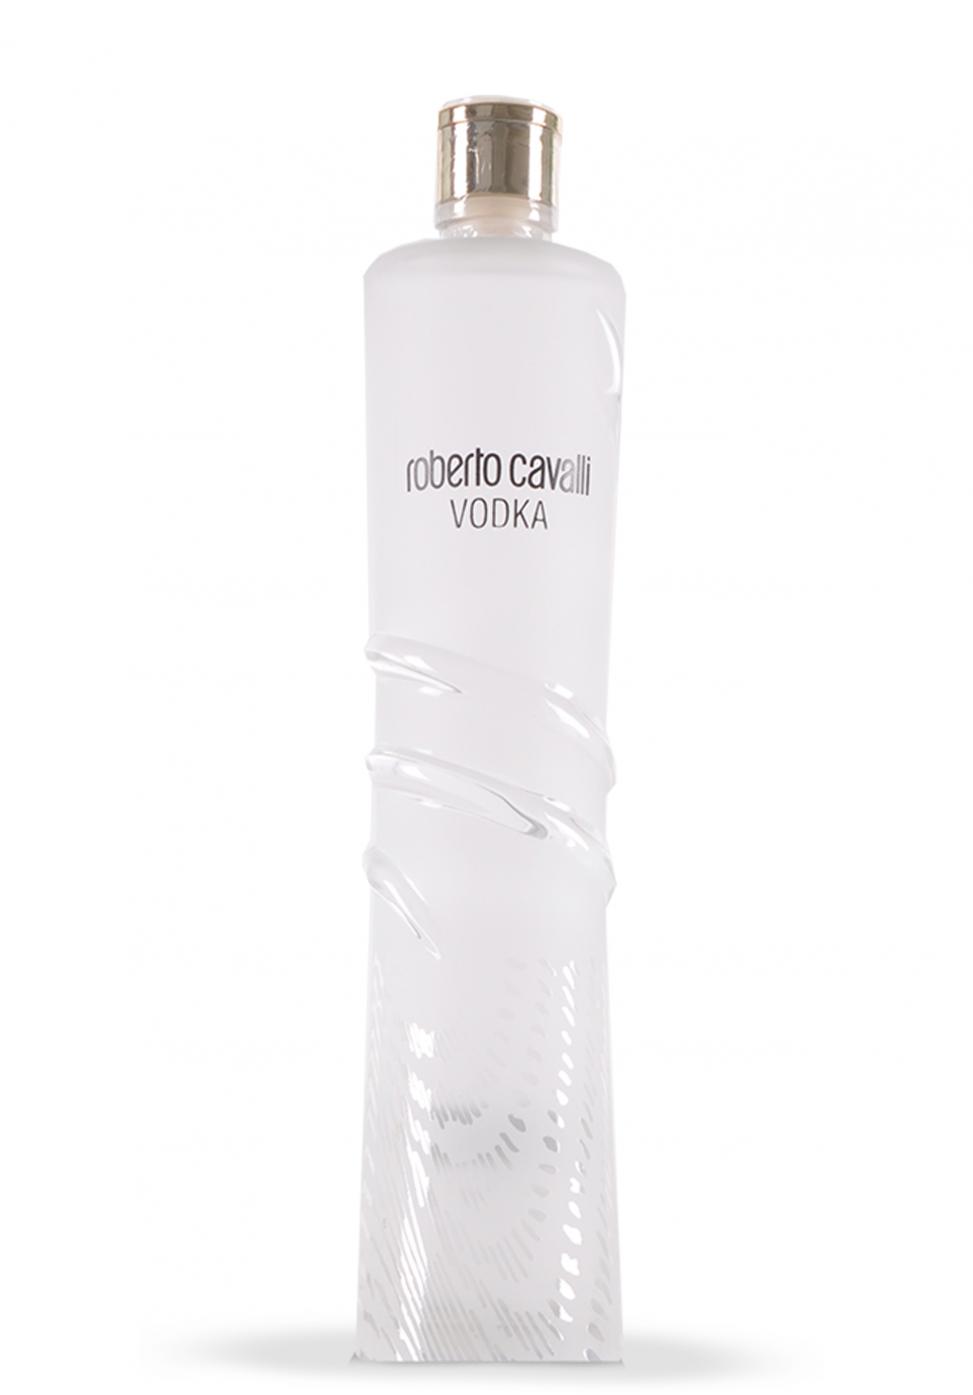 Vodka Roberto Cavalli (0.7L)